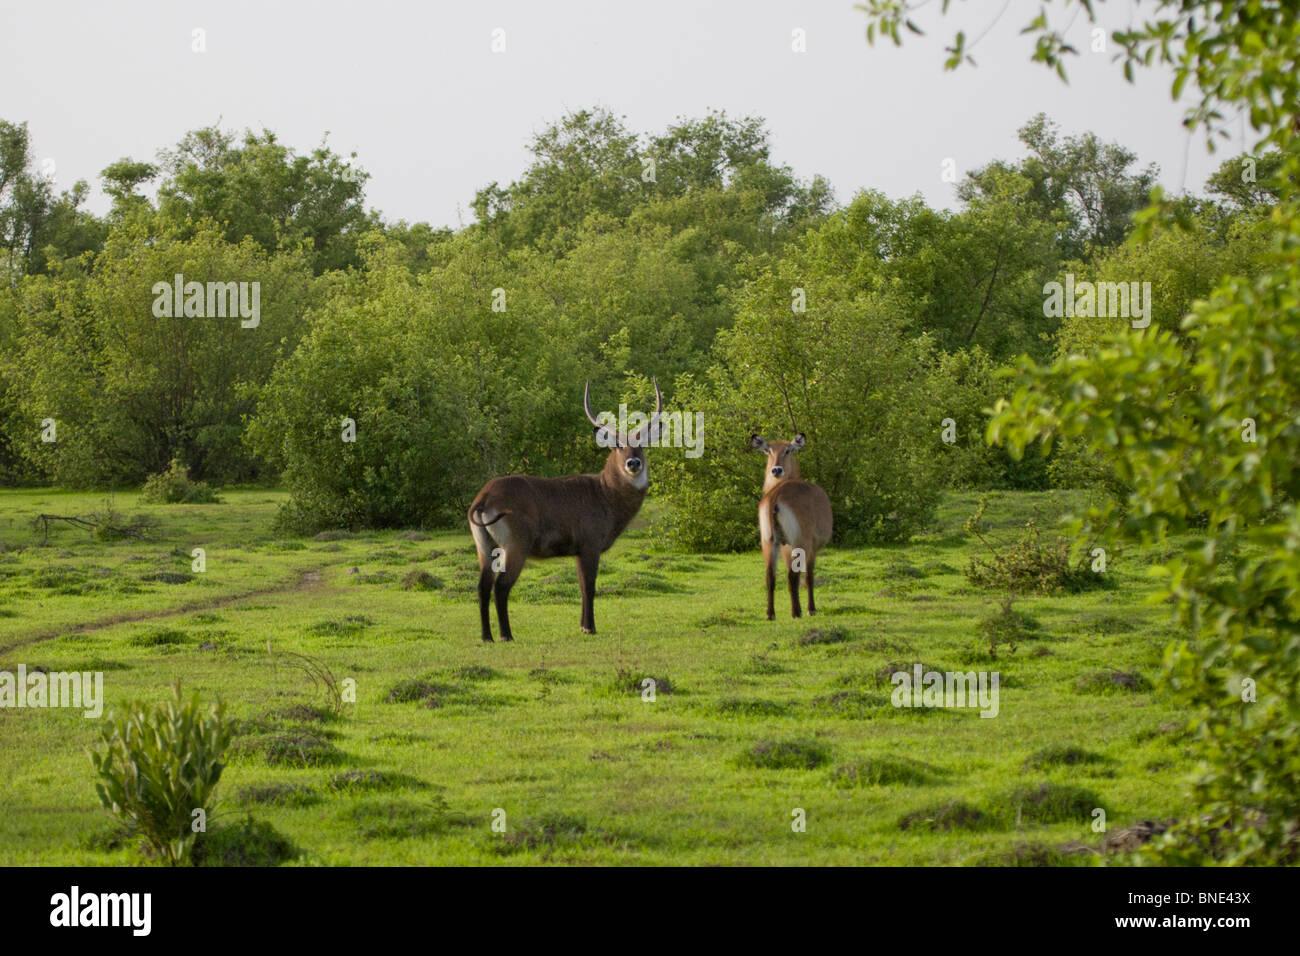 Pair of waterbuck, Kobus ellipsiprymnus, in Mole National Park, Ghana. - Stock Image